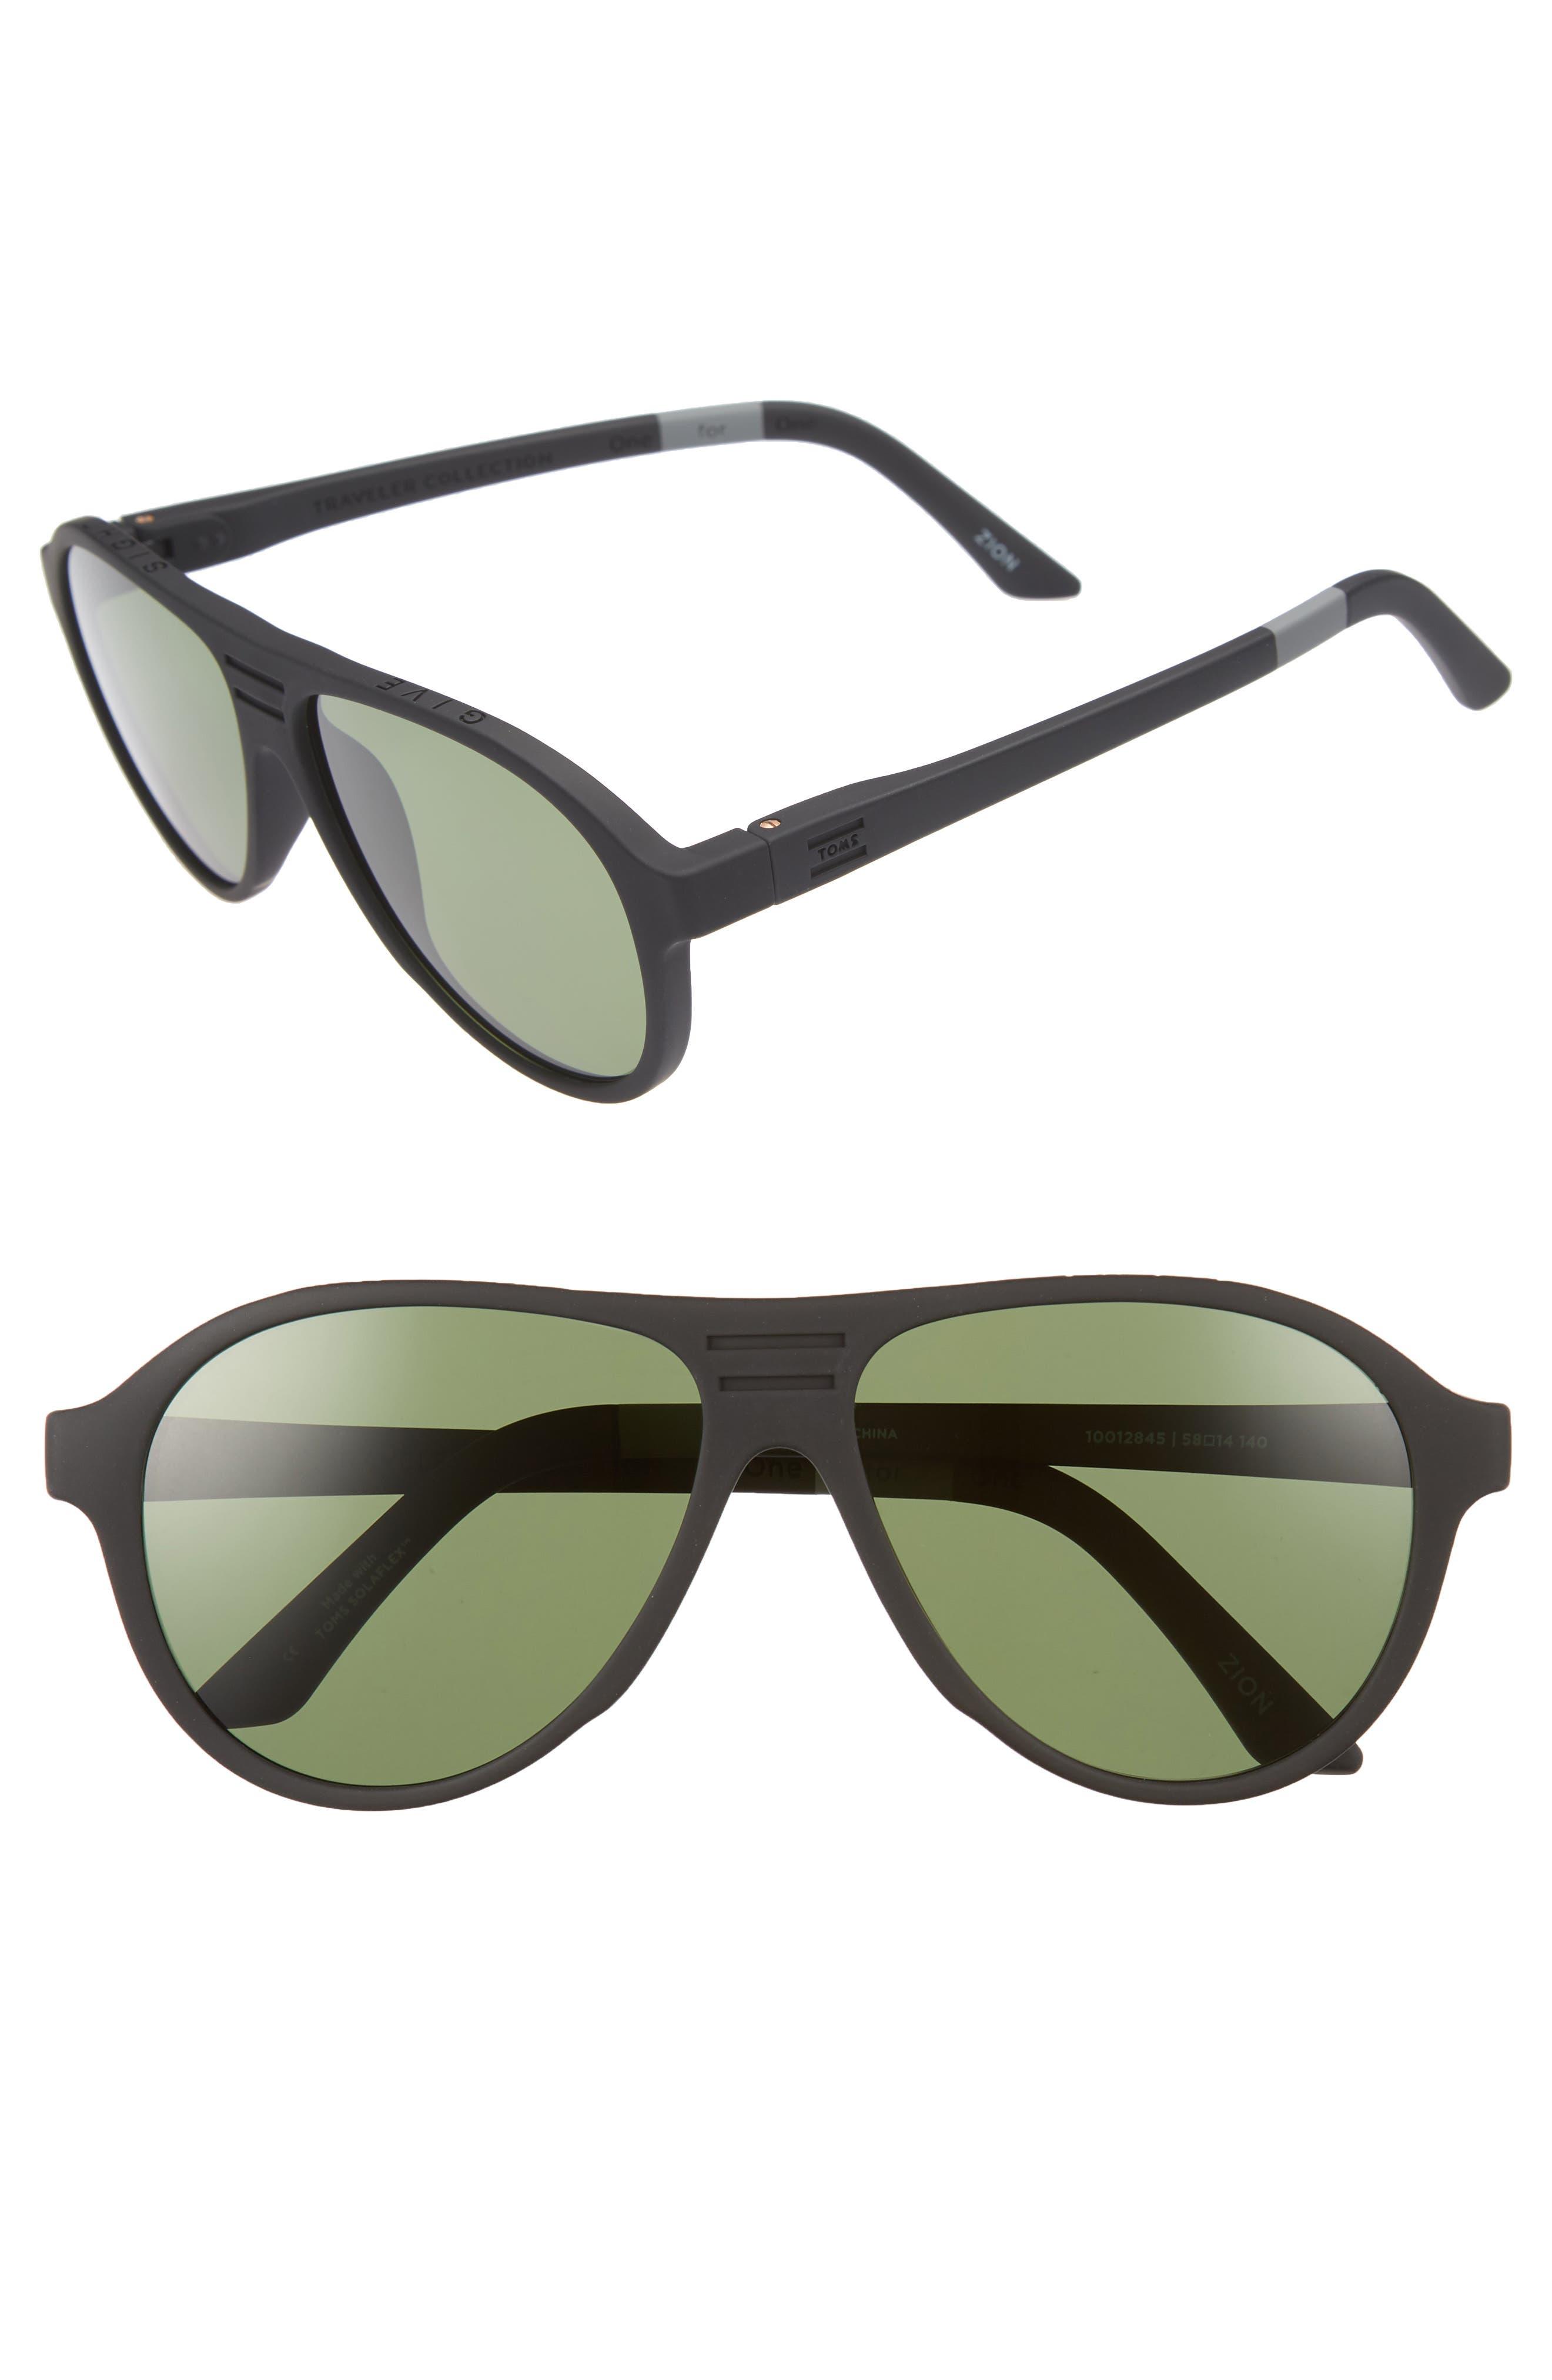 Traveler Zion 58mm Polarized Aviator Sunglasses,                             Main thumbnail 1, color,                             Matte Black/ Bottle Green